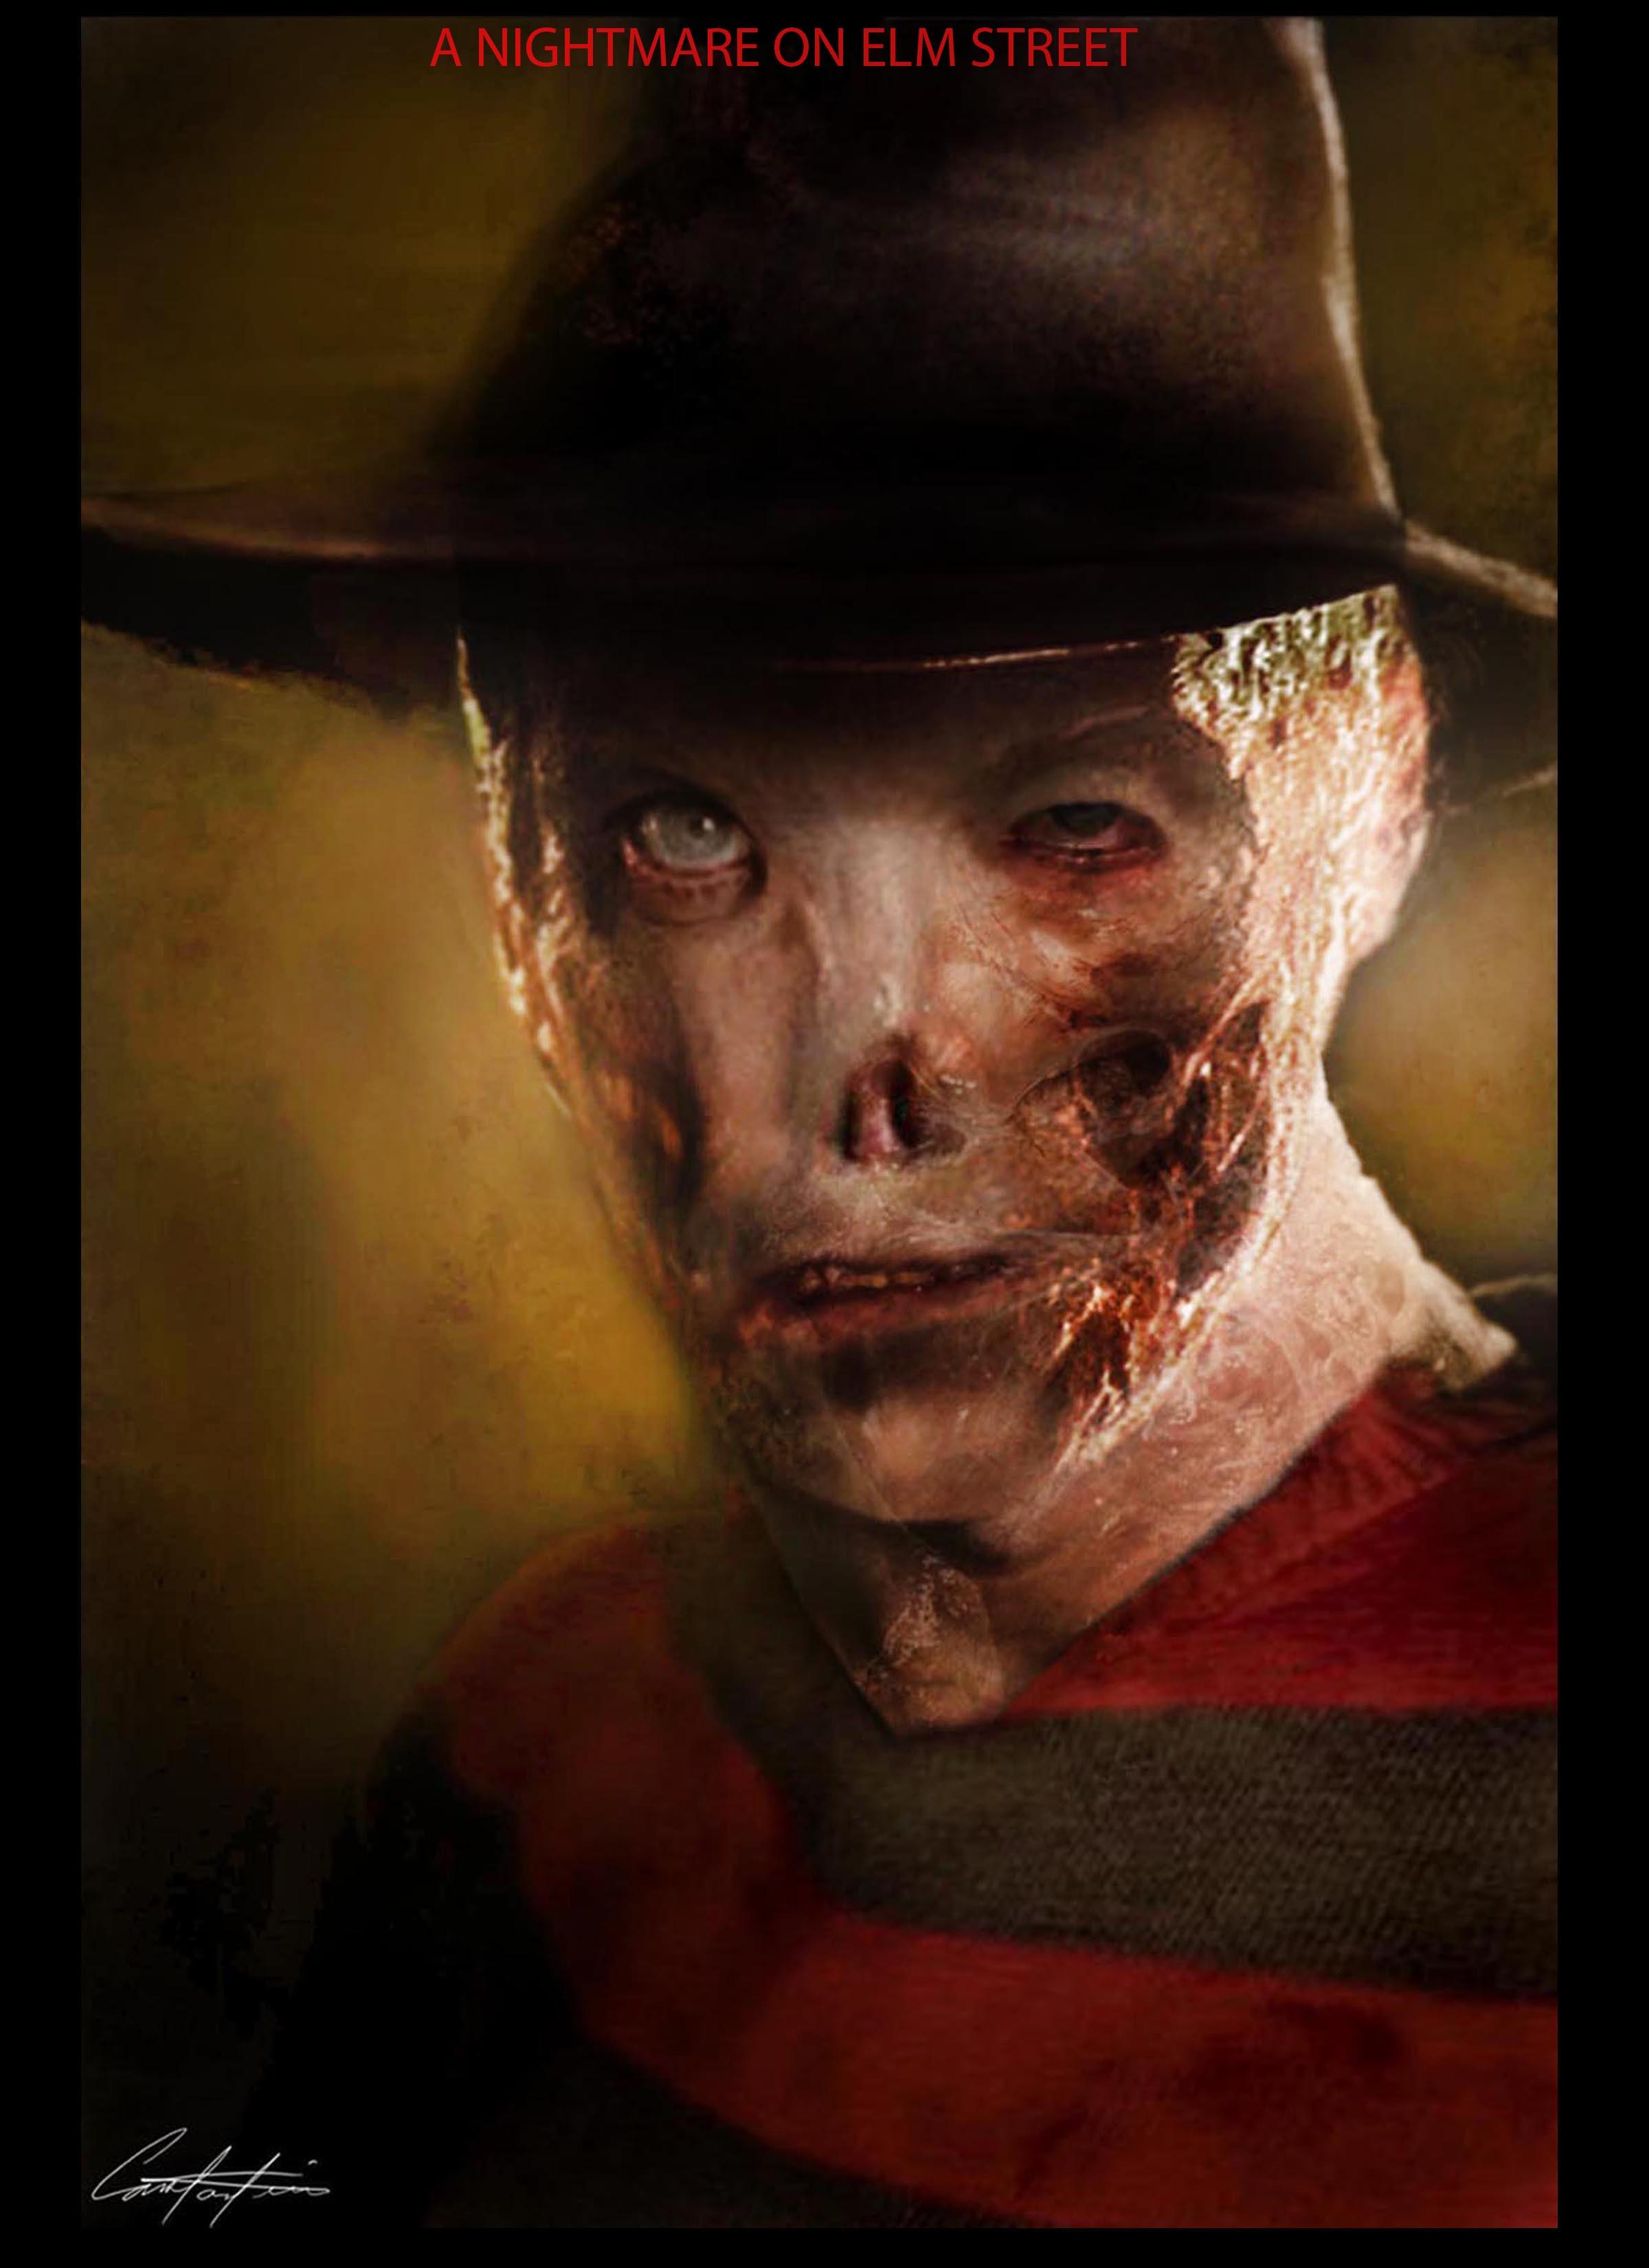 Freddy make-up design